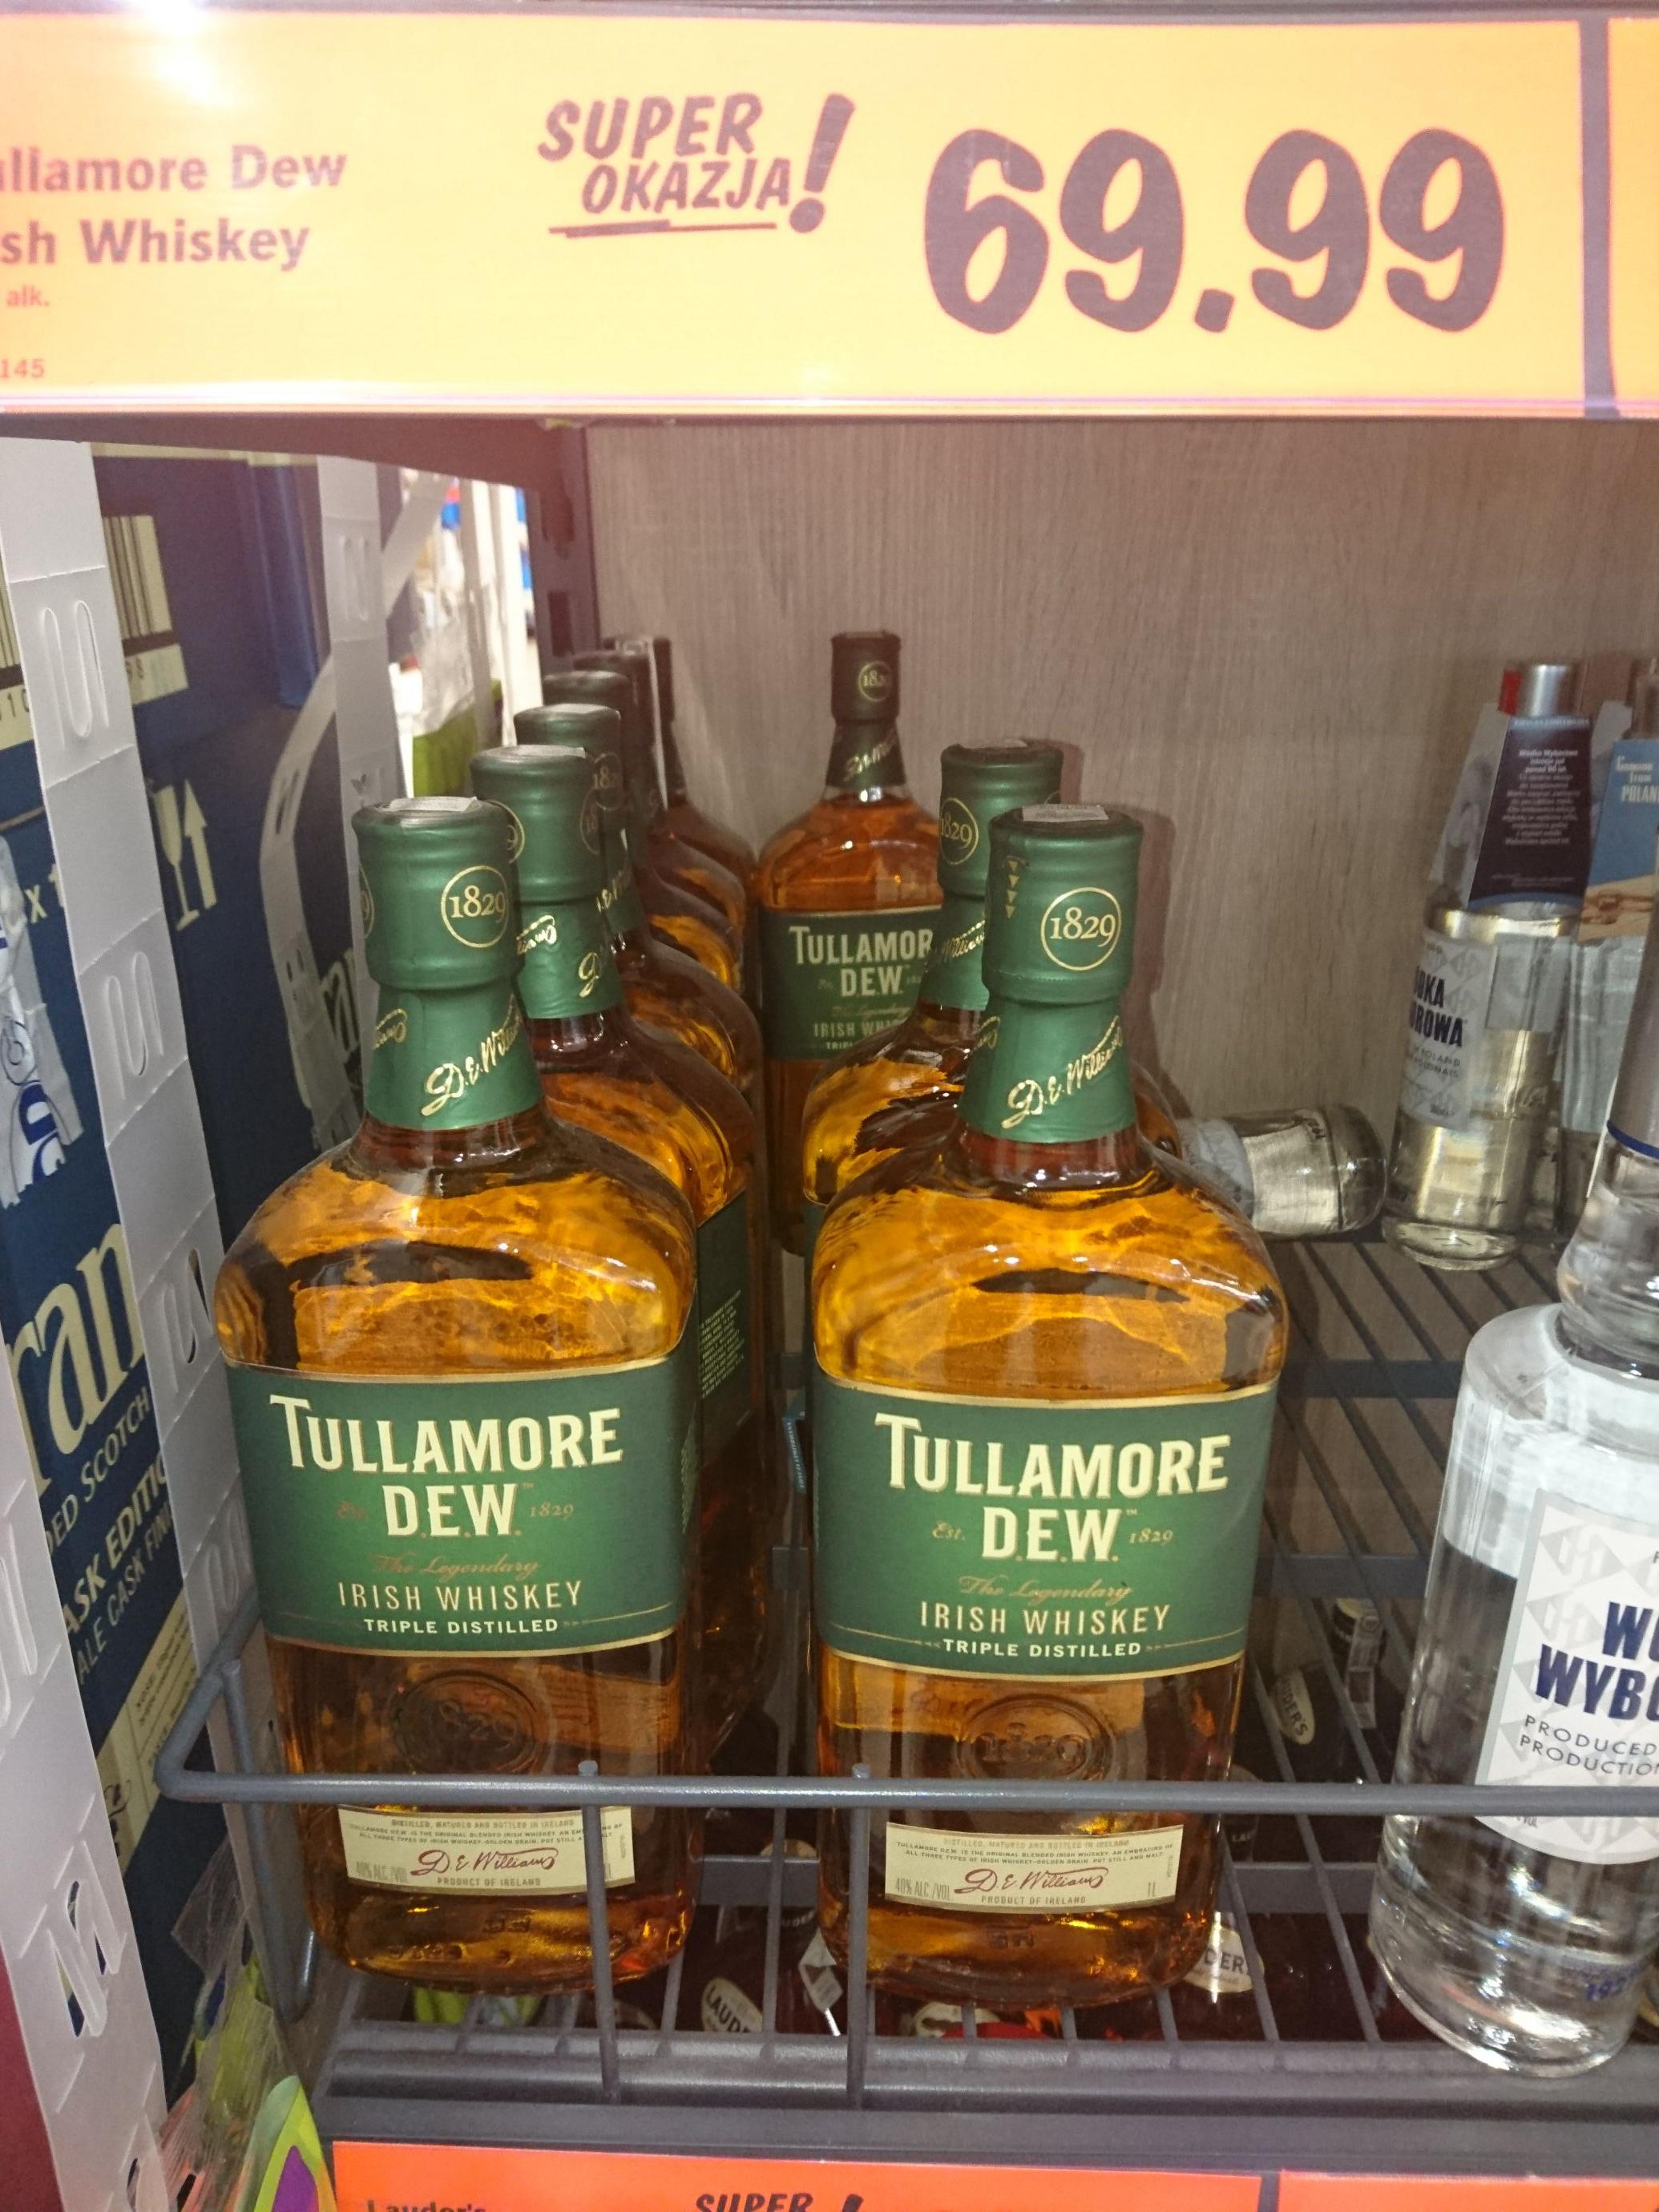 Lidl Whisky Tullamore Dew 1l